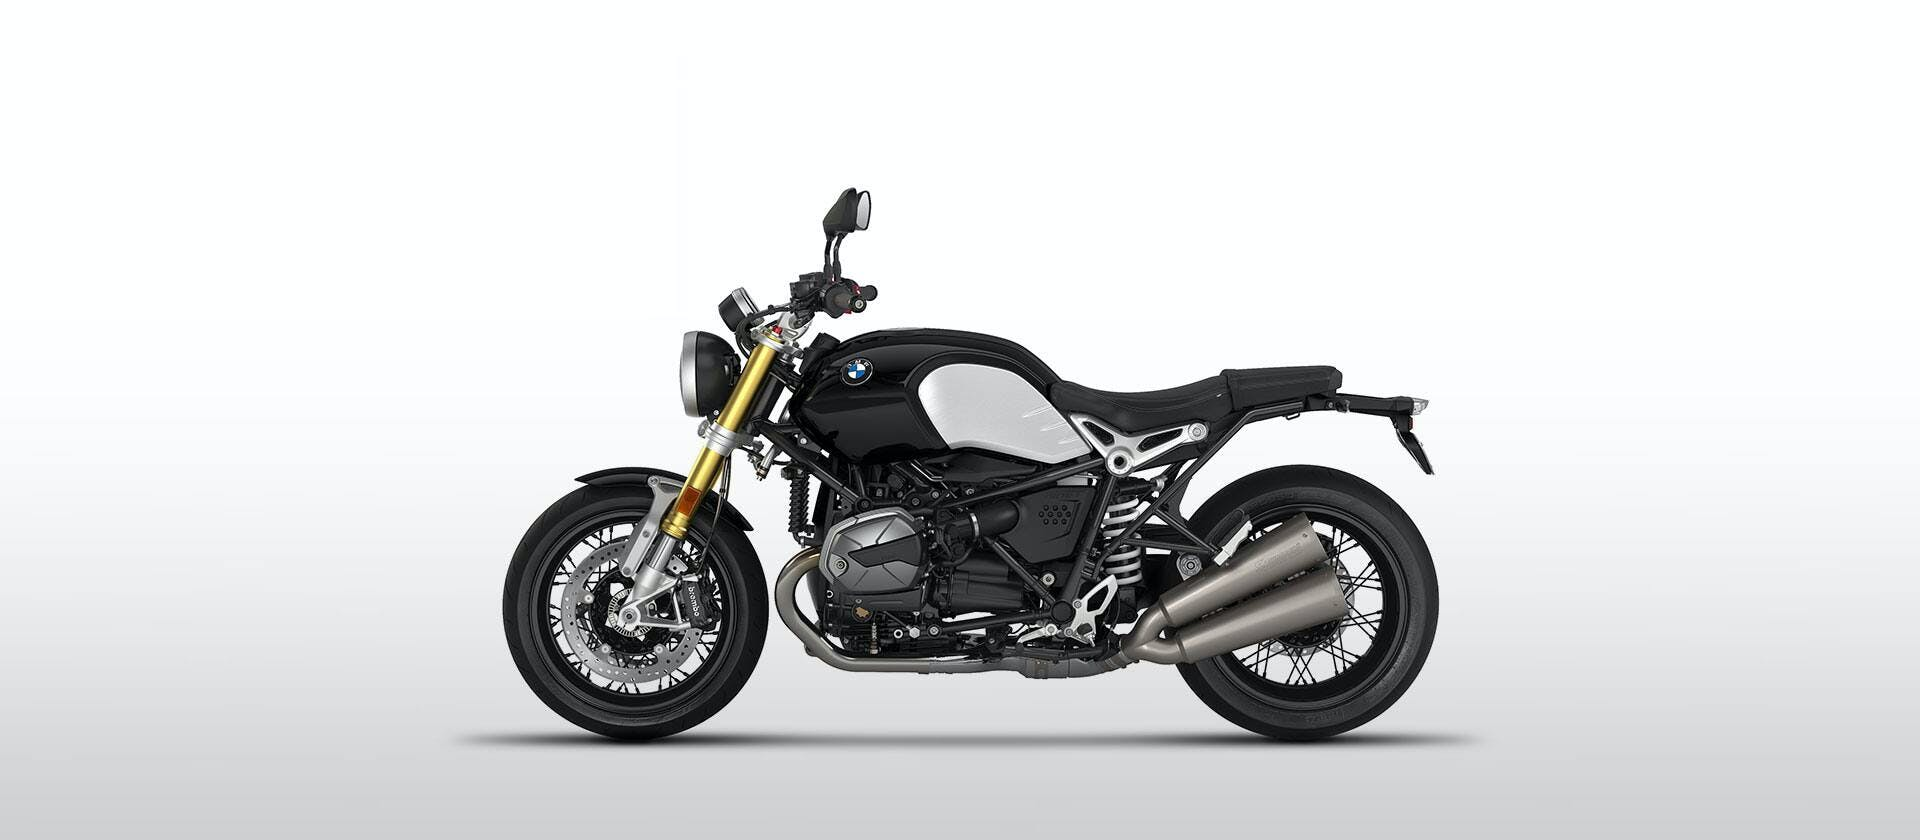 BMW R NINET in black storm metallic colour